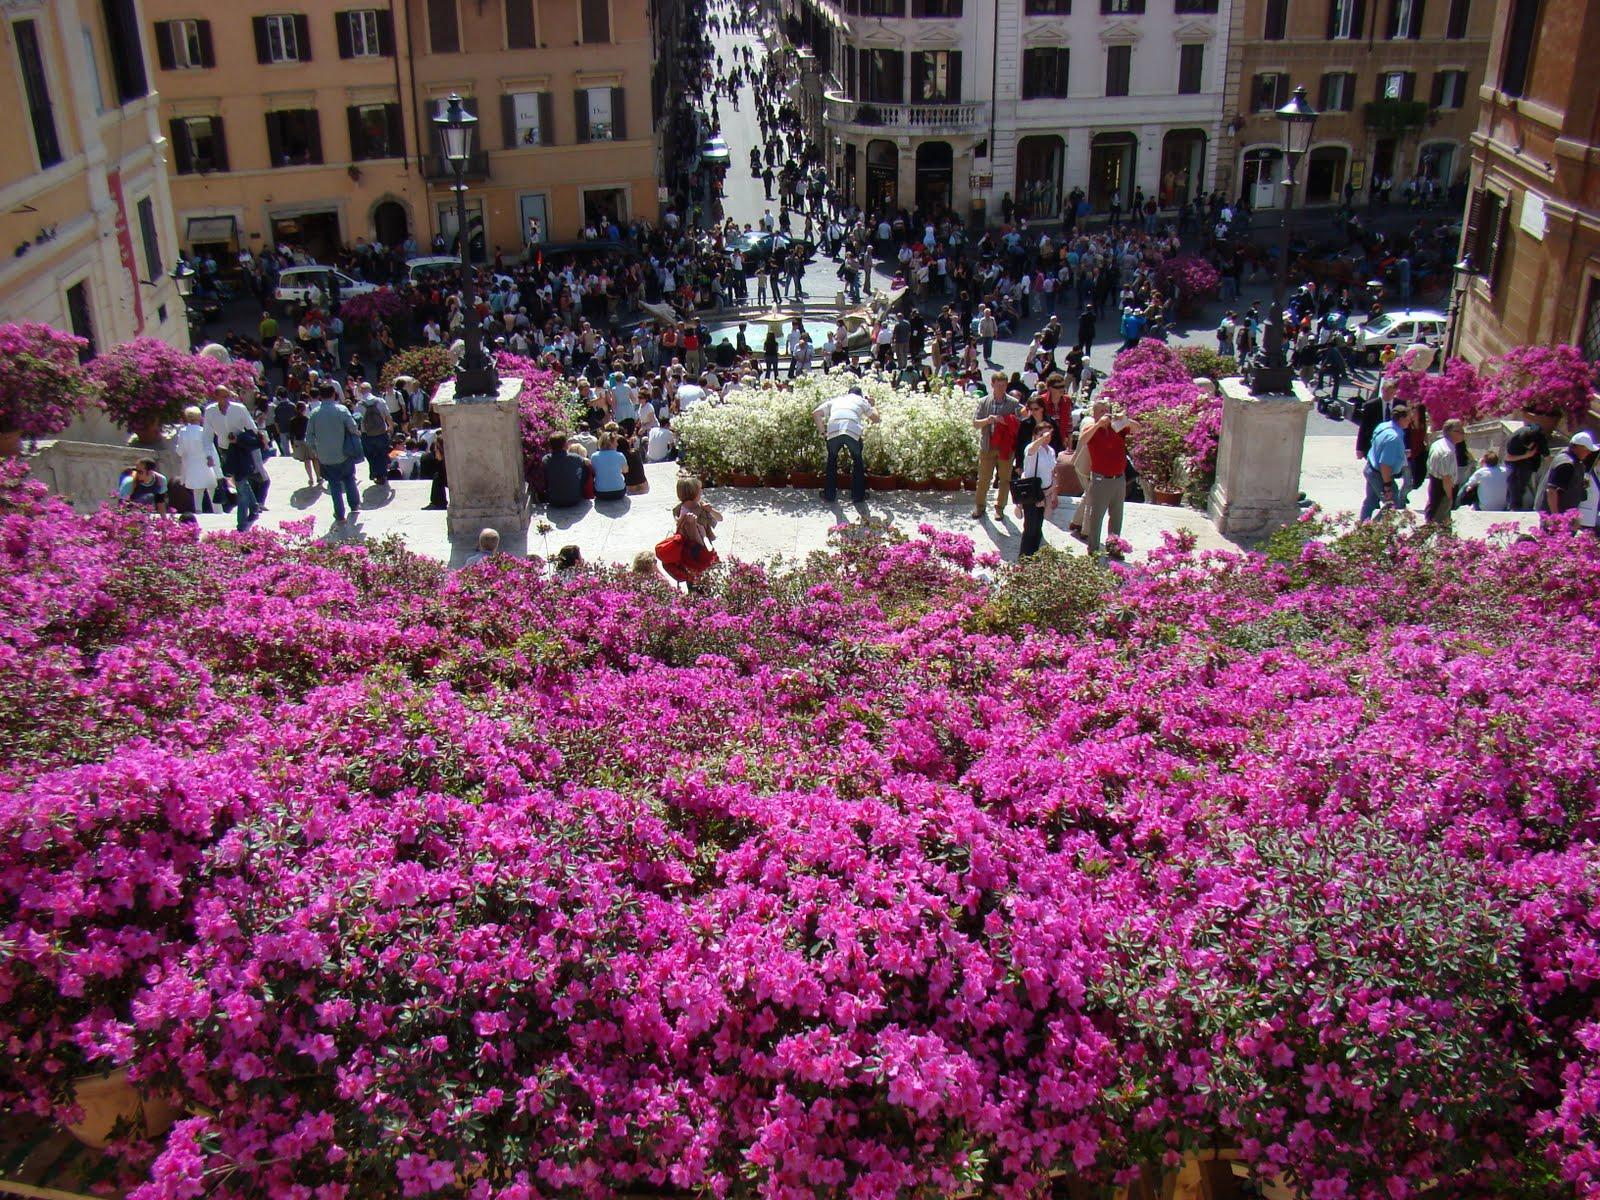 Roma, Italia, Elisa N, Blog de Viajes, Lifestyle, Travel